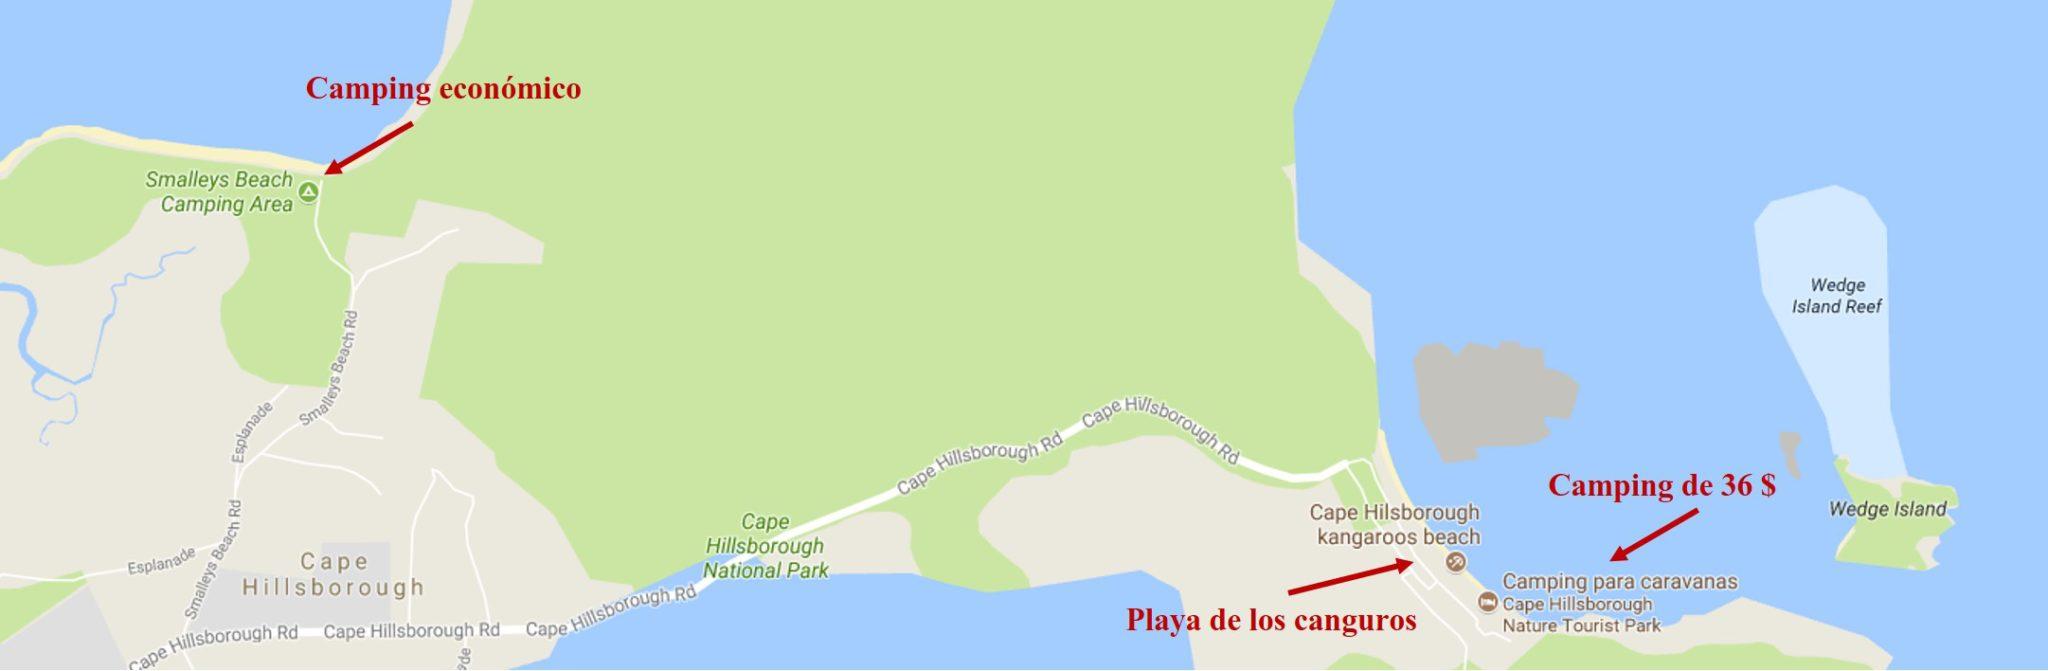 Mapa Cape Hillsborough Nature Tourist Park